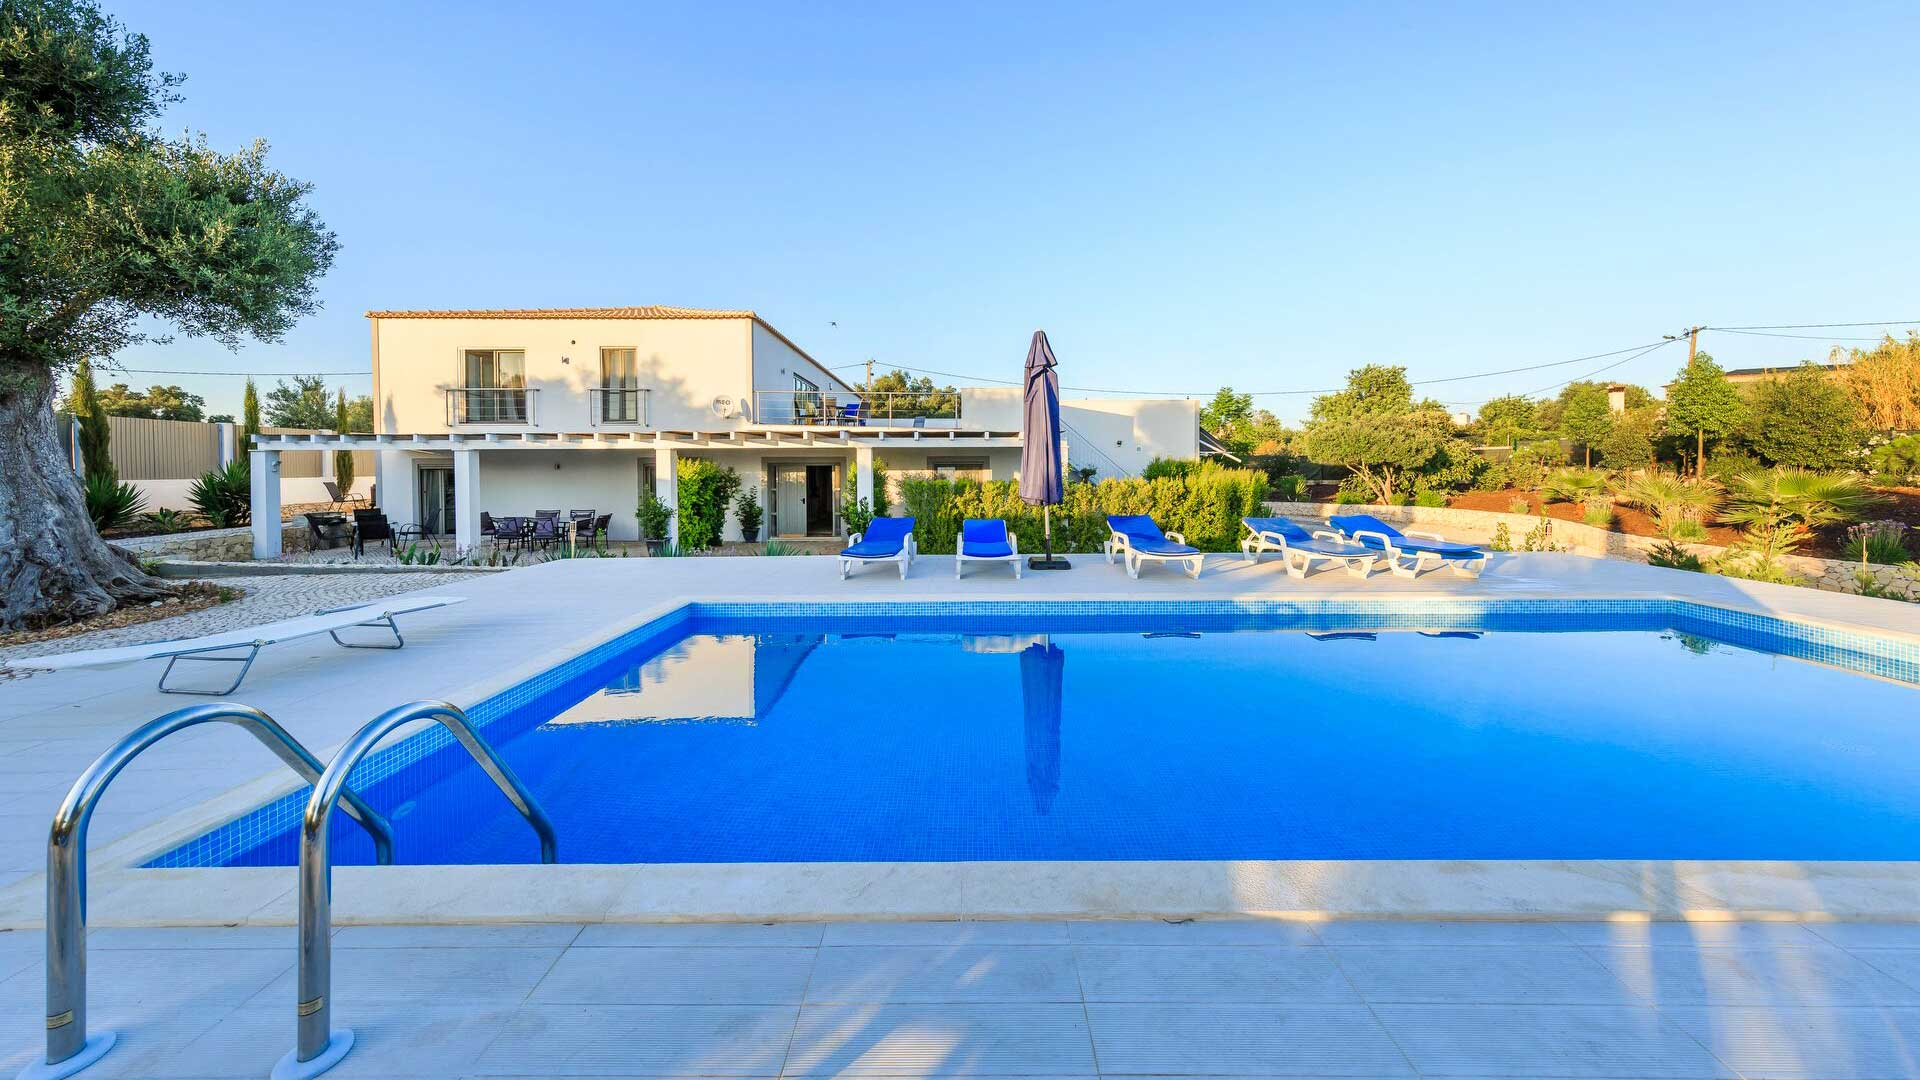 Villa Villa Garneiro, Rental in Algarve